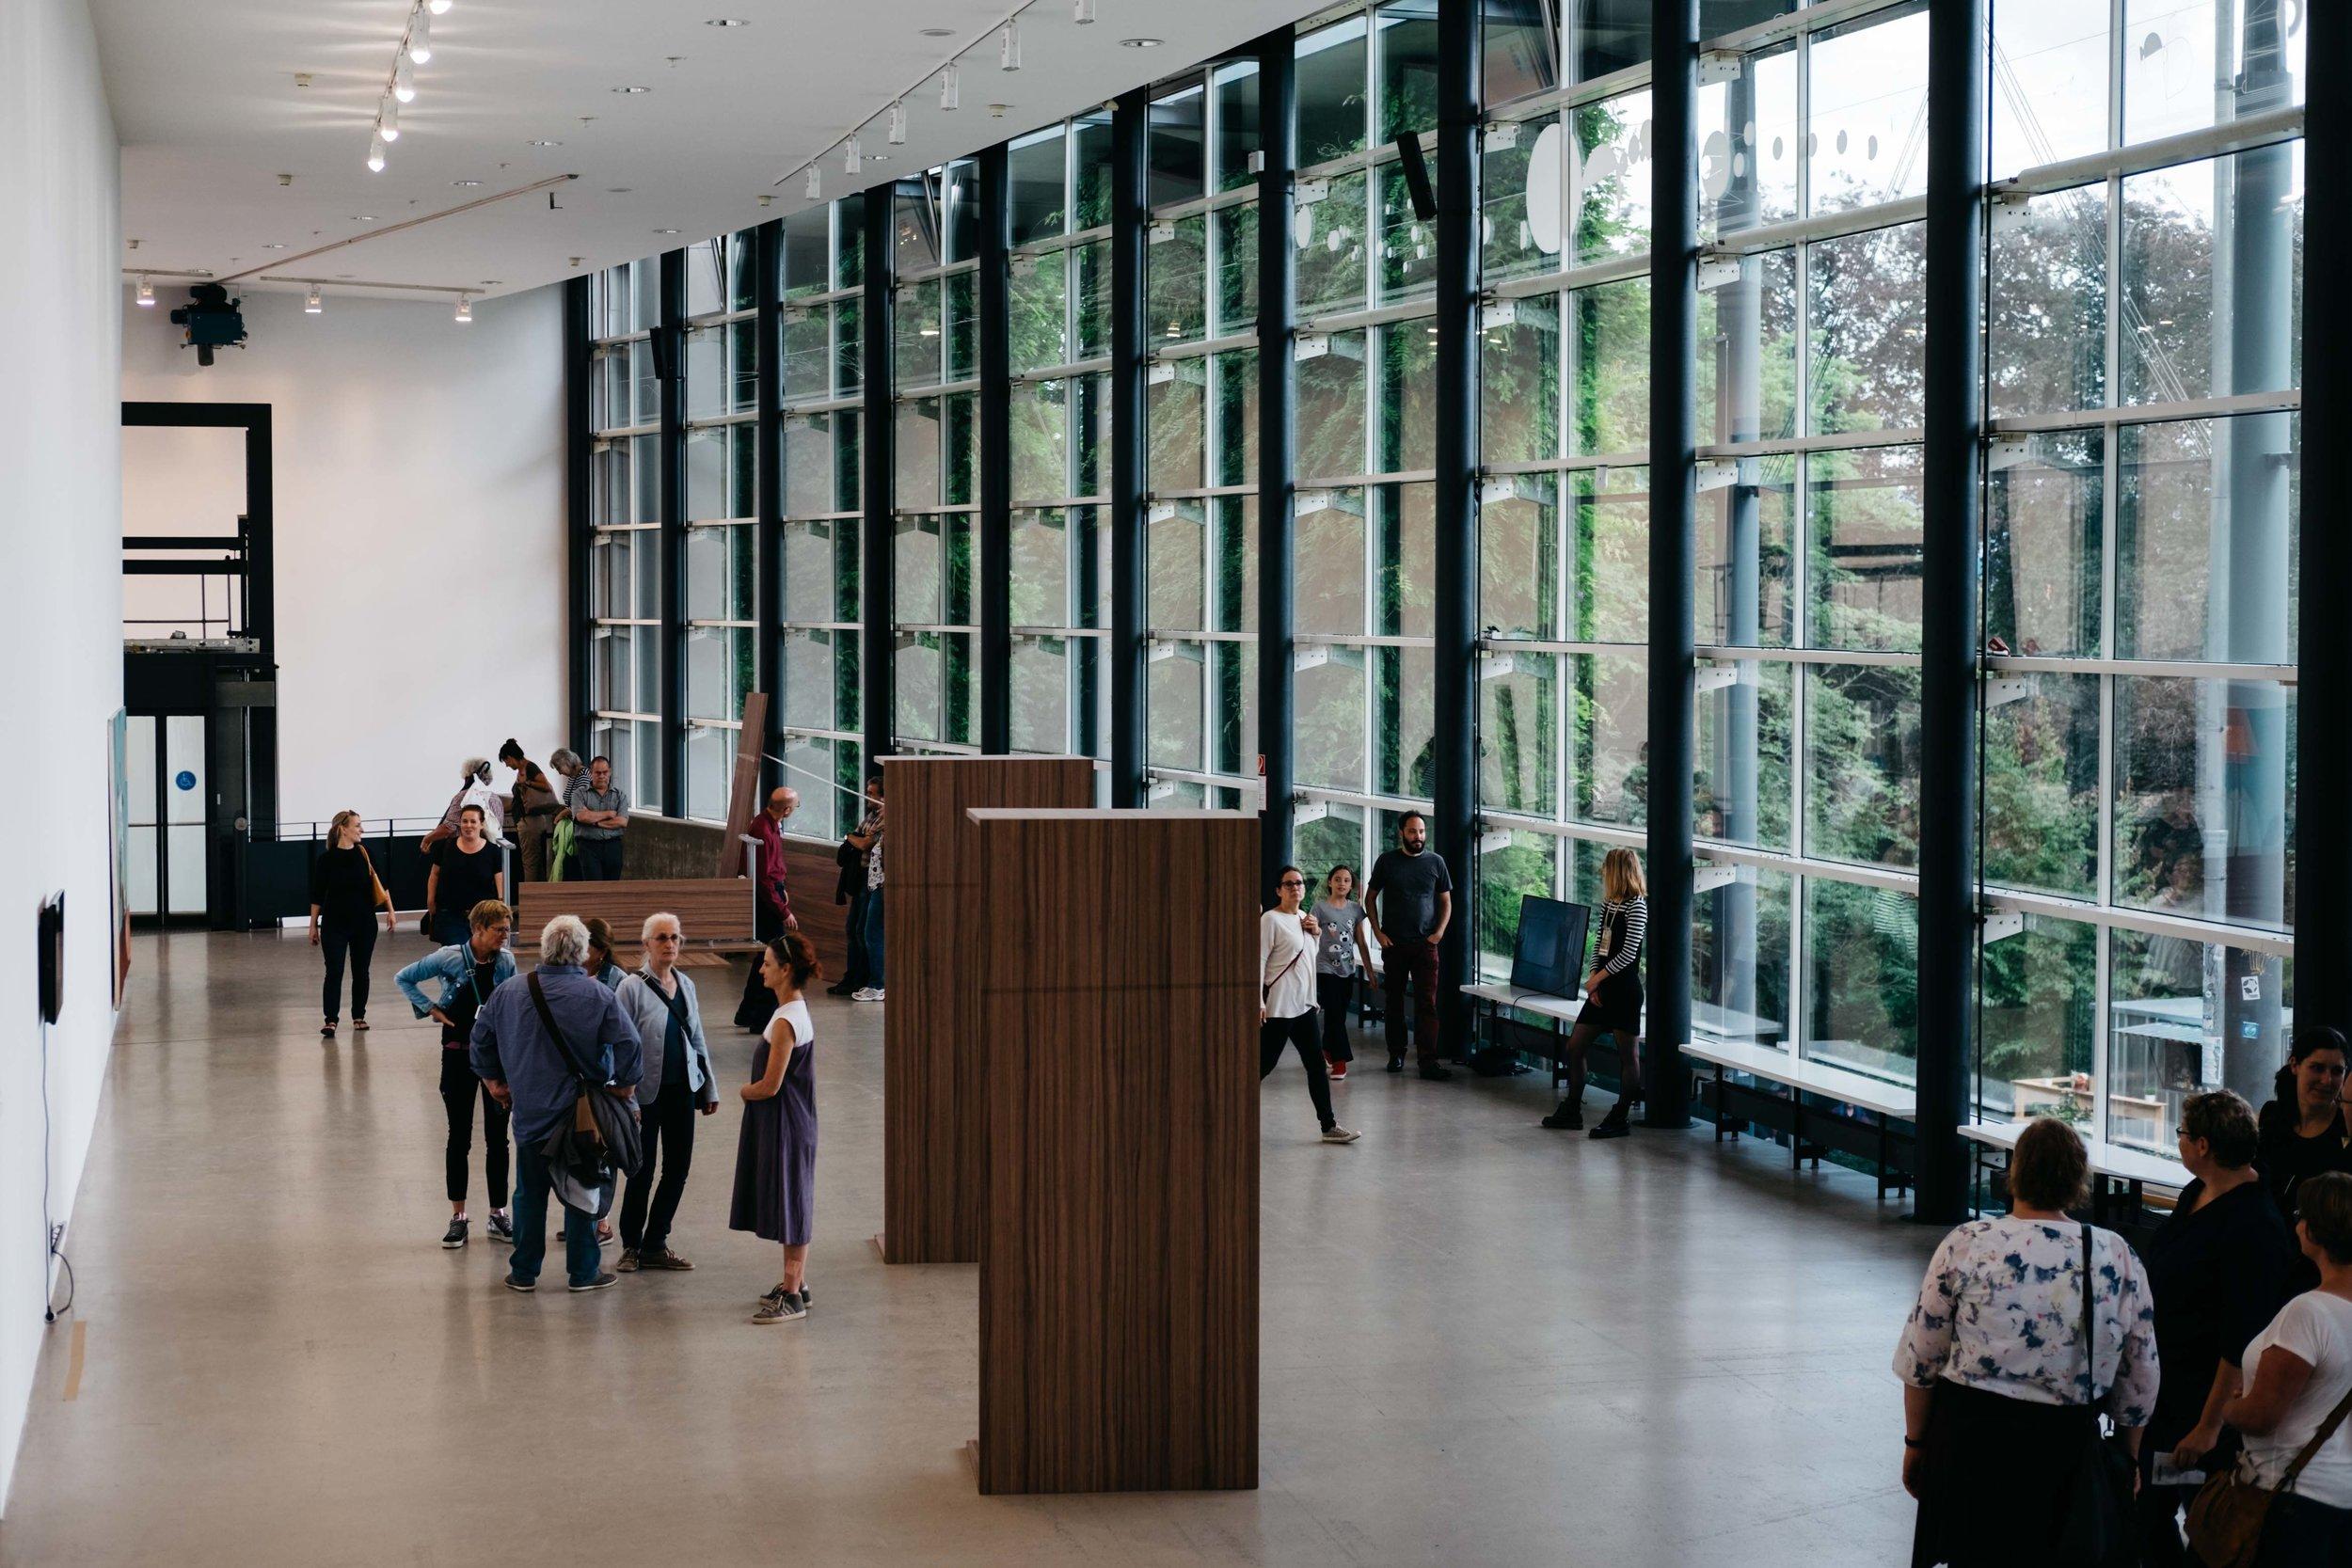 documenta14-kassel-kunst-wearecity-simonhariman-2017-103.jpg